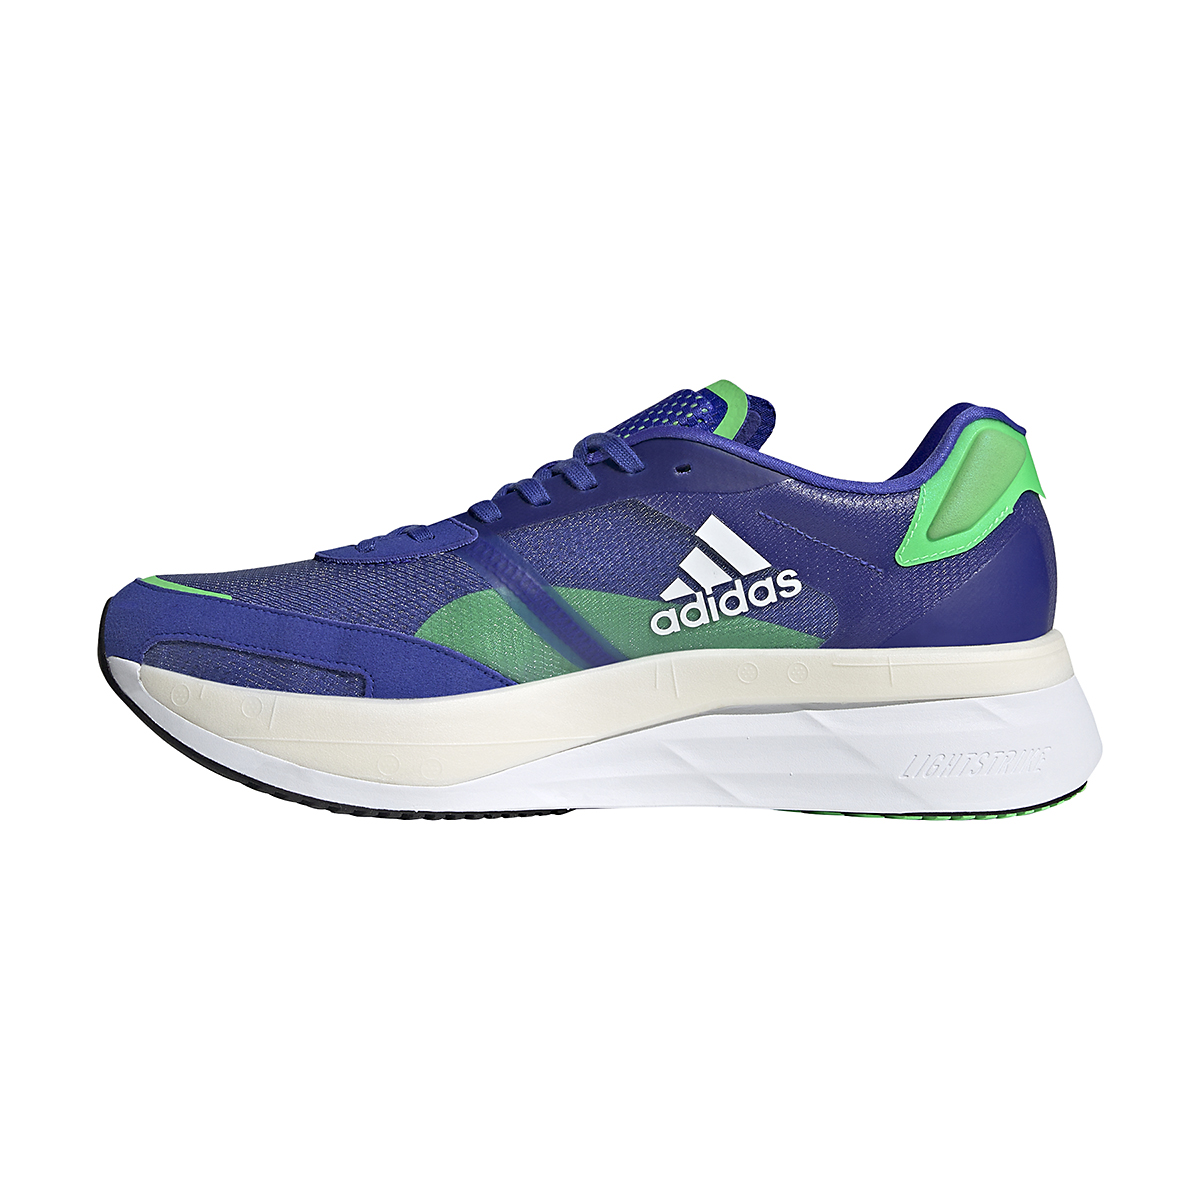 Men's Adidas Adizero Boston 10 Running Shoe - Color: Sonic Ink/White/Screaming Green - Size: 6.5 - Width: Regular, Sonic Ink/White/Screaming Green, large, image 2